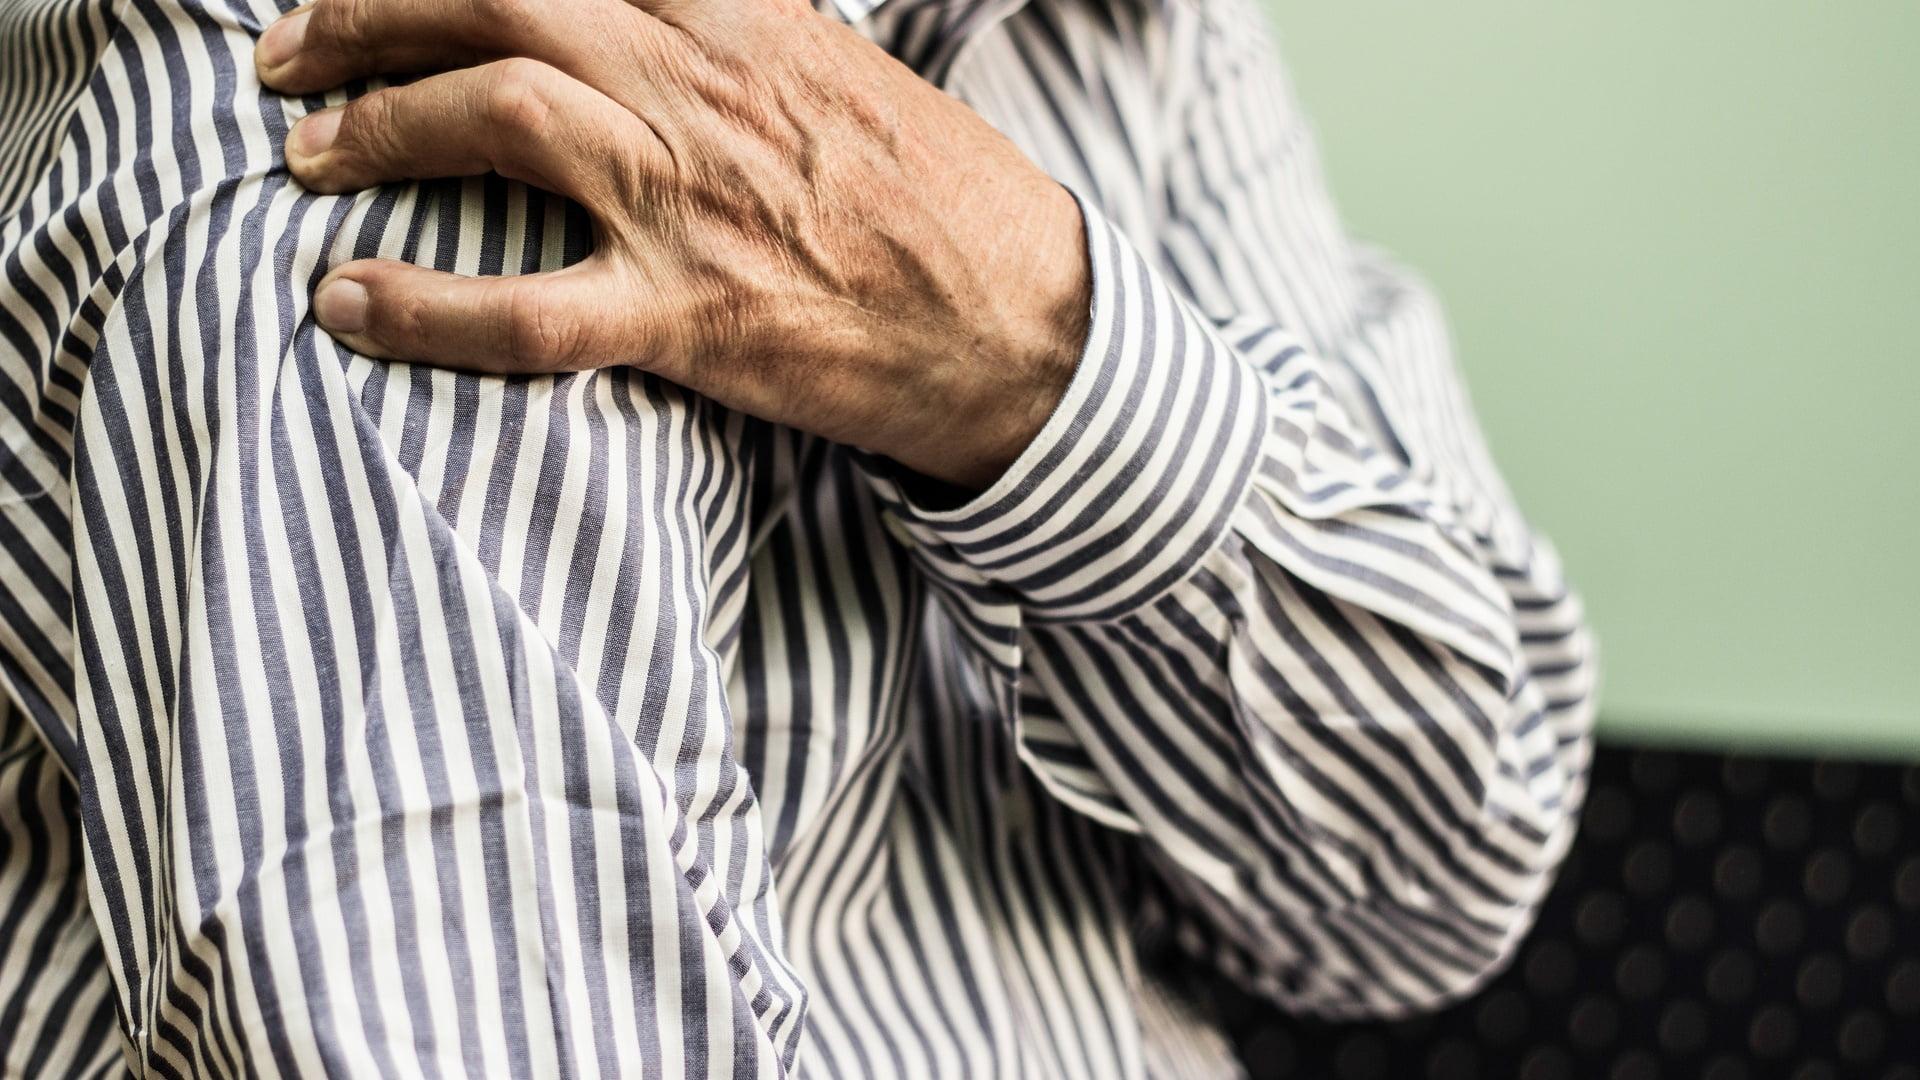 Tratament reumatism (dureri de articulatii, artroza, reumatism articular)